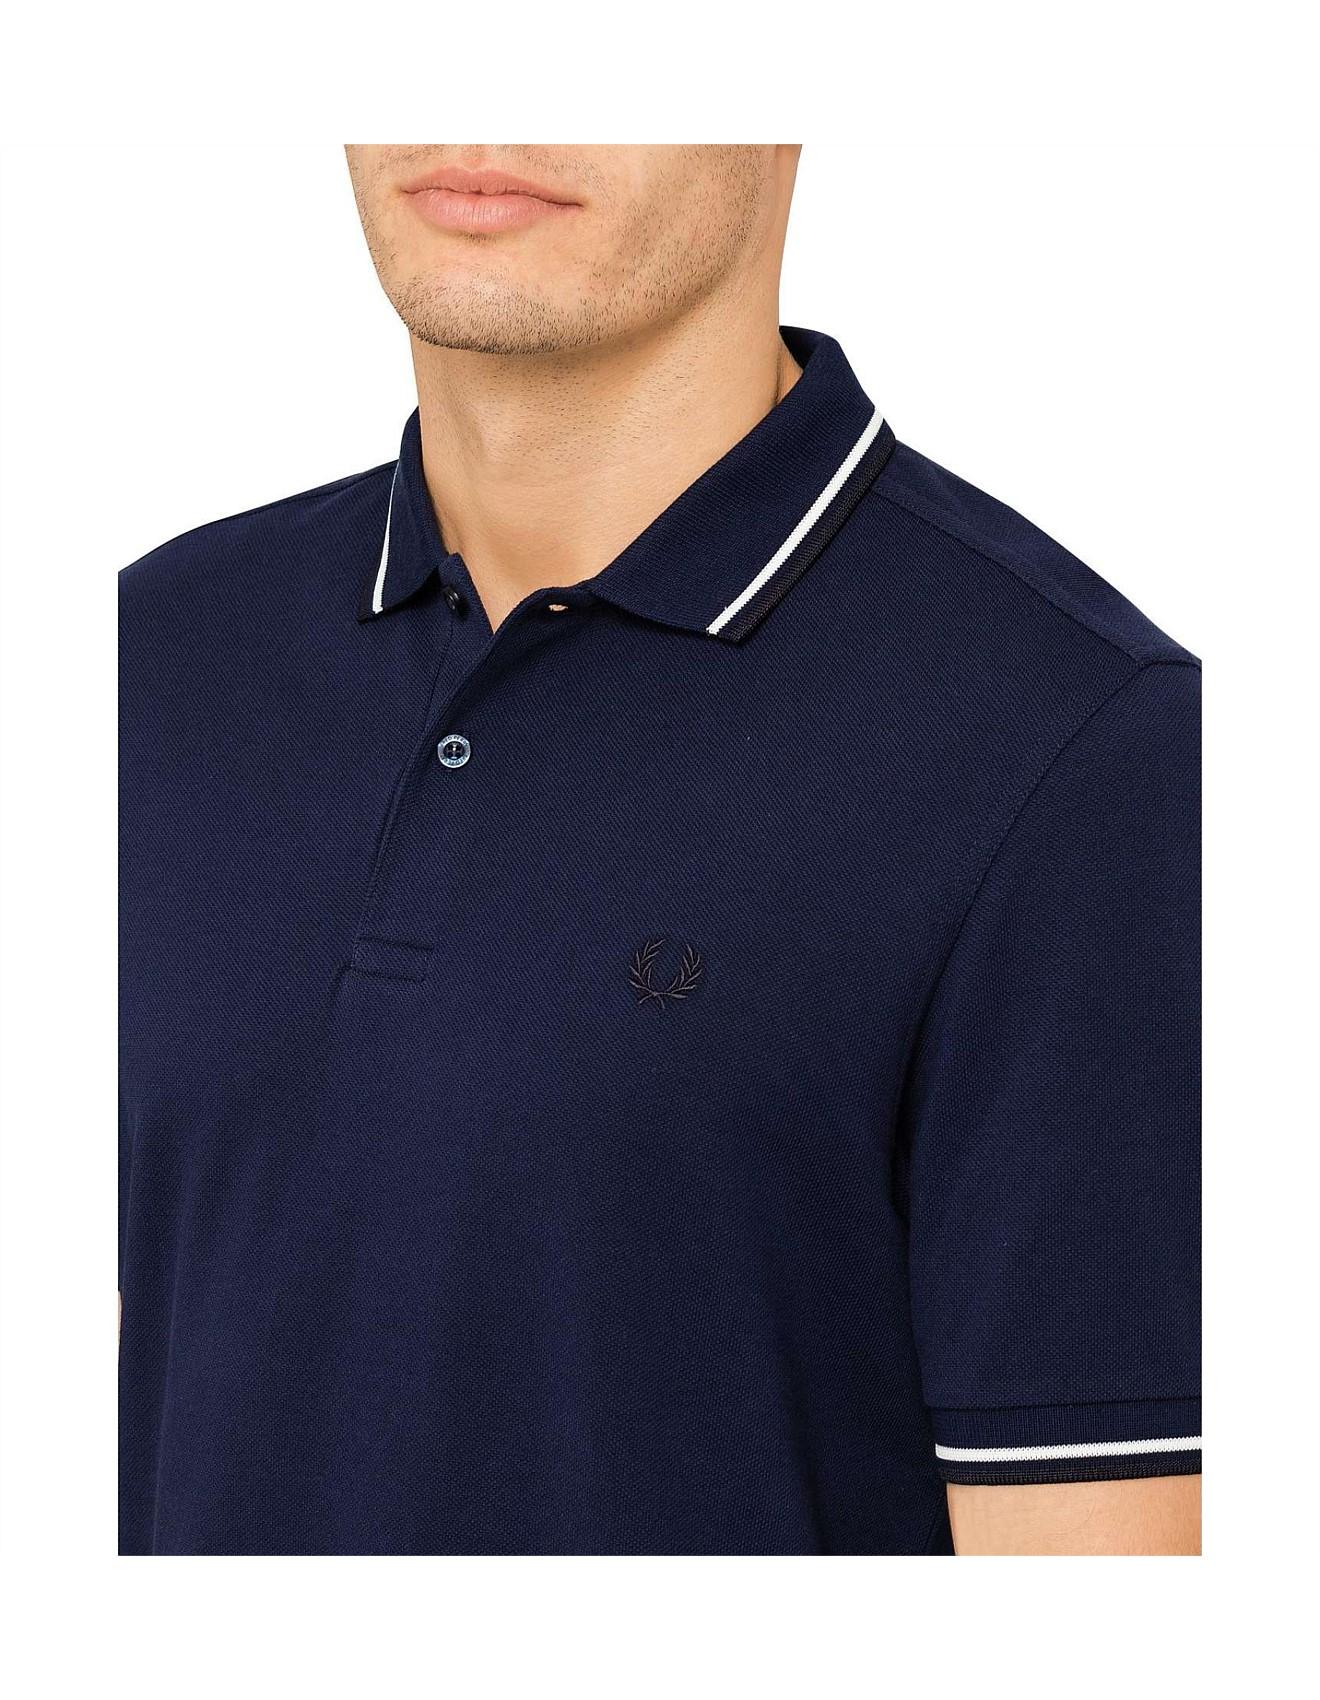 men 39 s polo shirts sale buy polo shirts online david. Black Bedroom Furniture Sets. Home Design Ideas